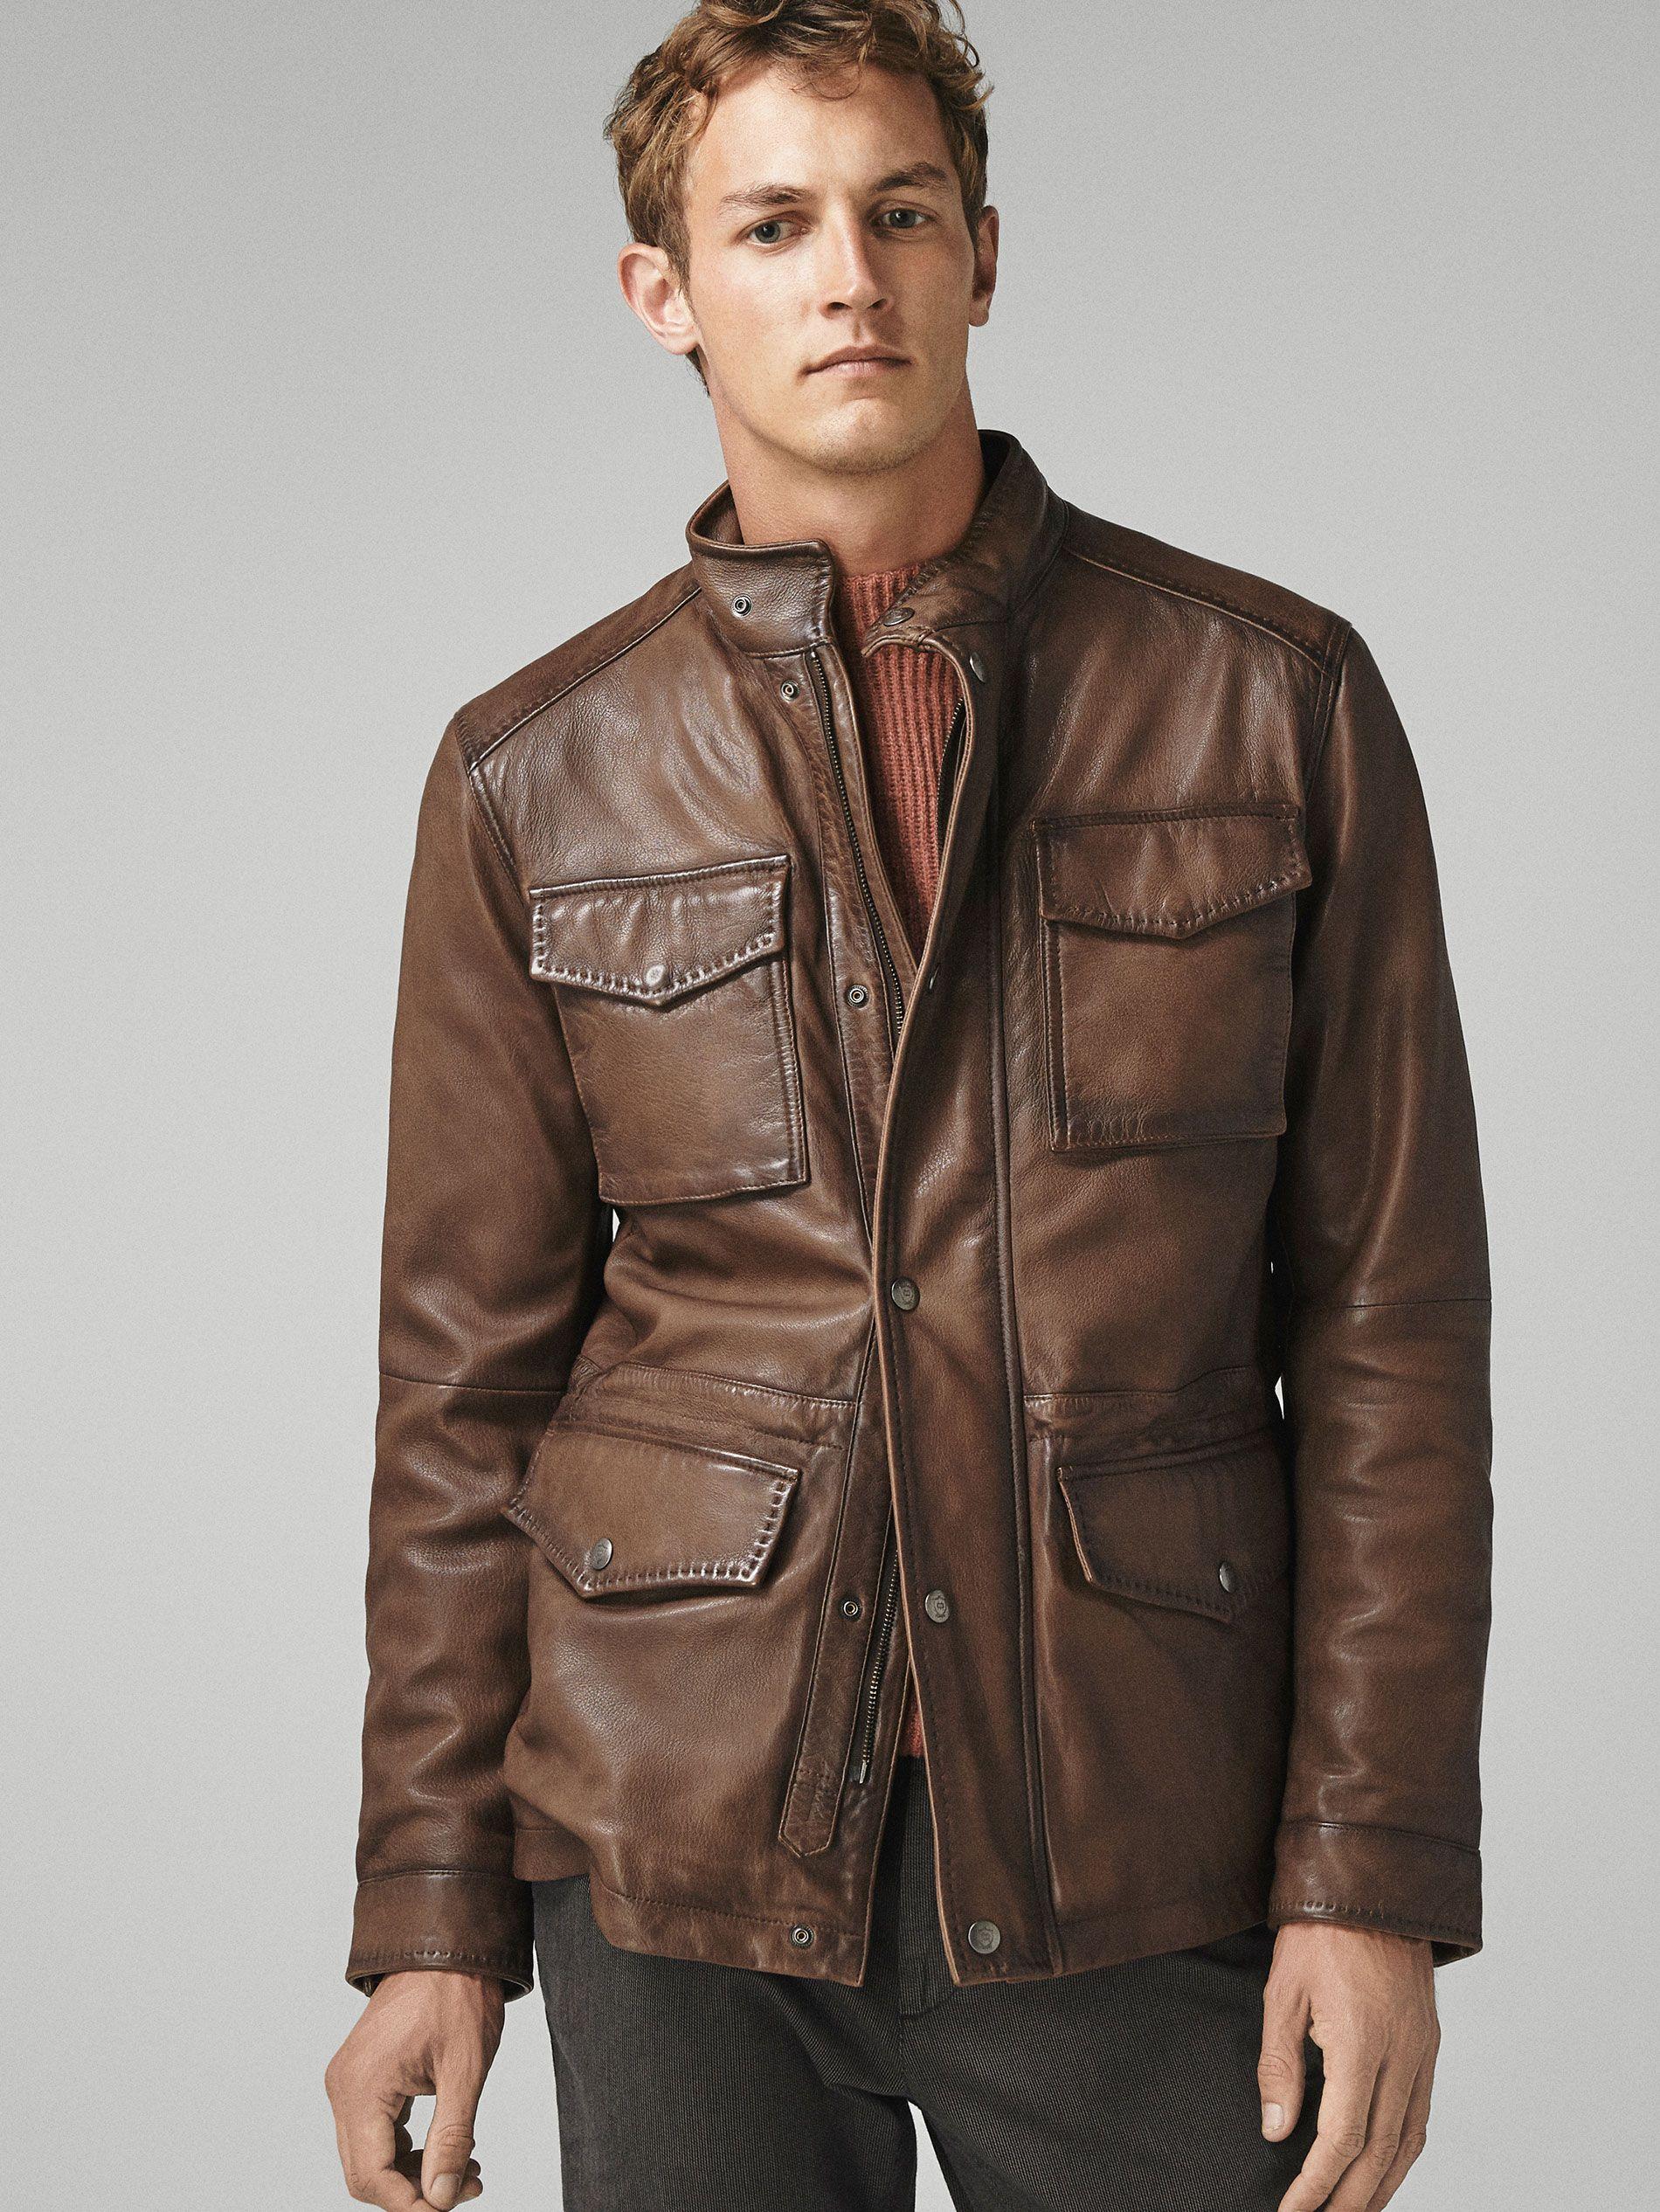 Siluet Leather Jacket Leather Jacket Men Winter Leather Jackets